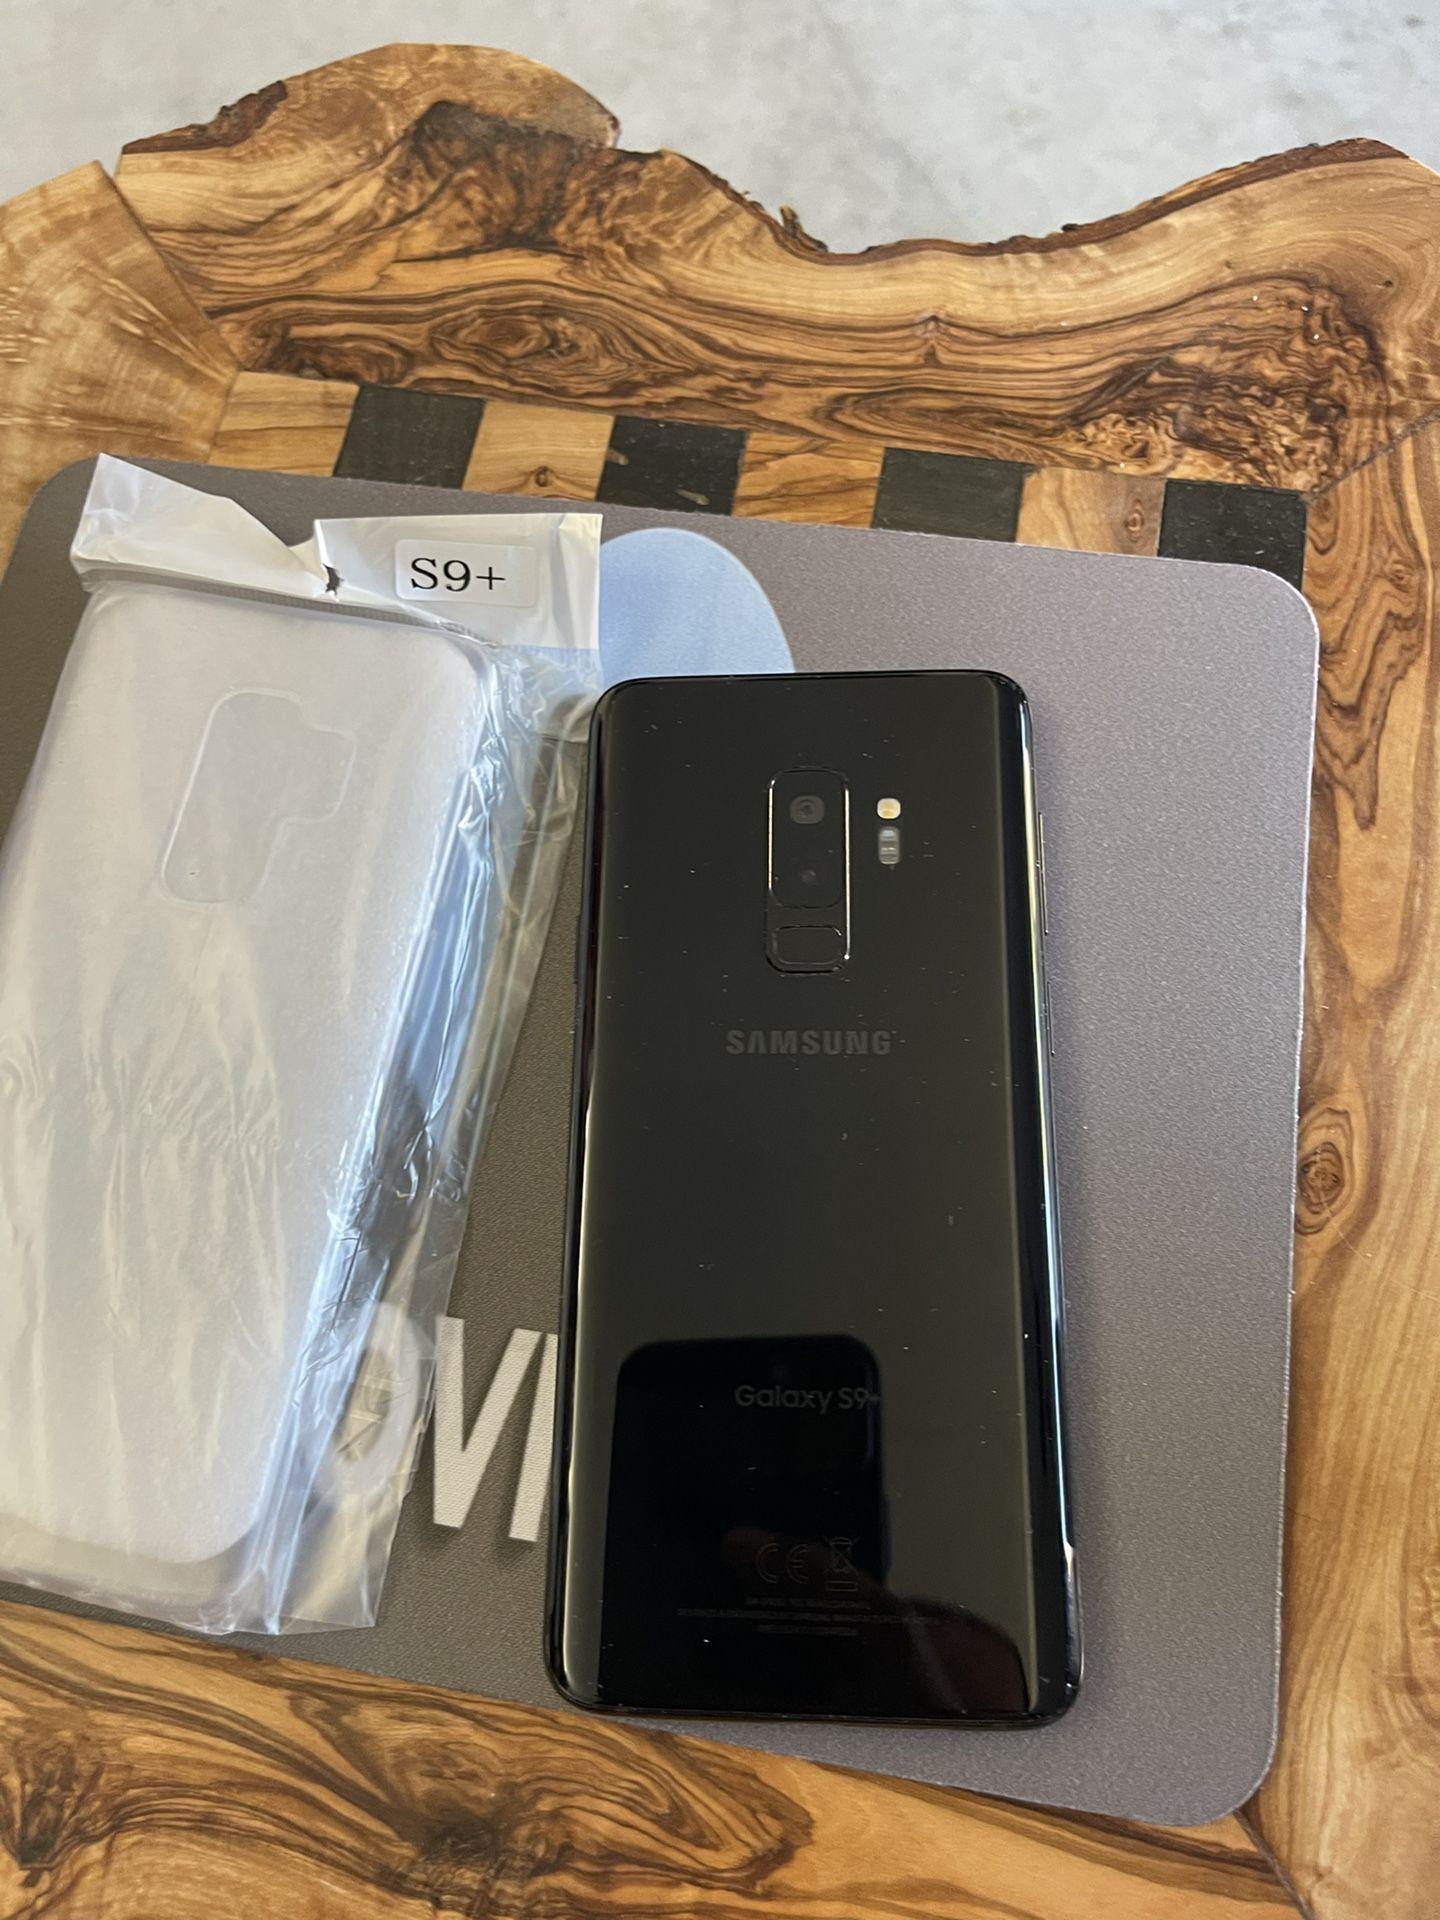 Samsung Galaxy S9 Plus 64GB Black Unlocked For Any Simcard